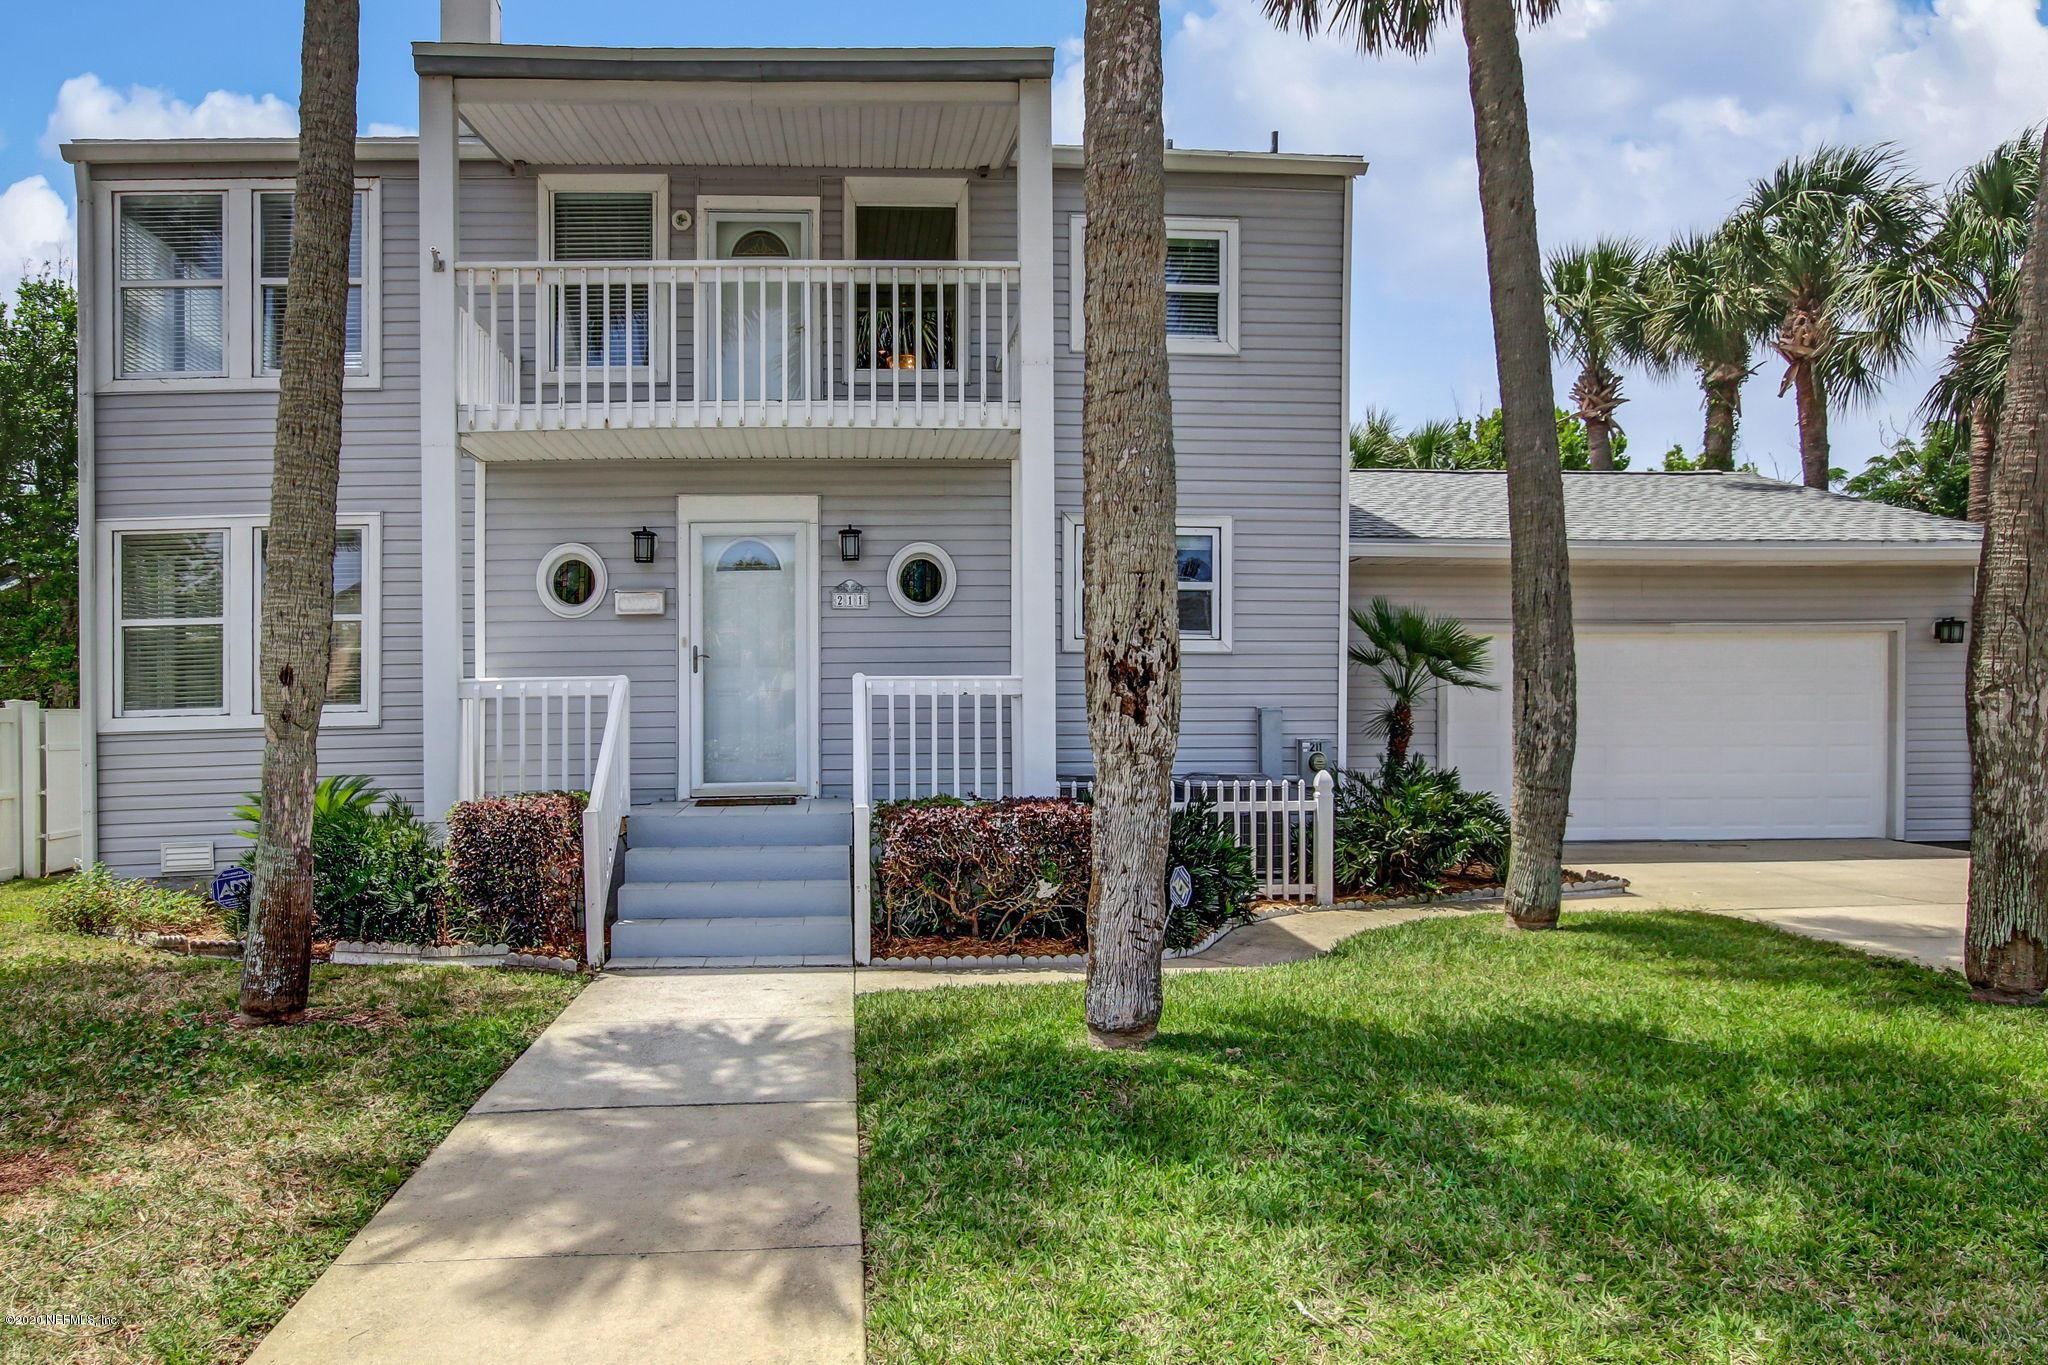 211 WALNUT, NEPTUNE BEACH, FLORIDA 32266, 4 Bedrooms Bedrooms, ,4 BathroomsBathrooms,Residential,For sale,WALNUT,1054049